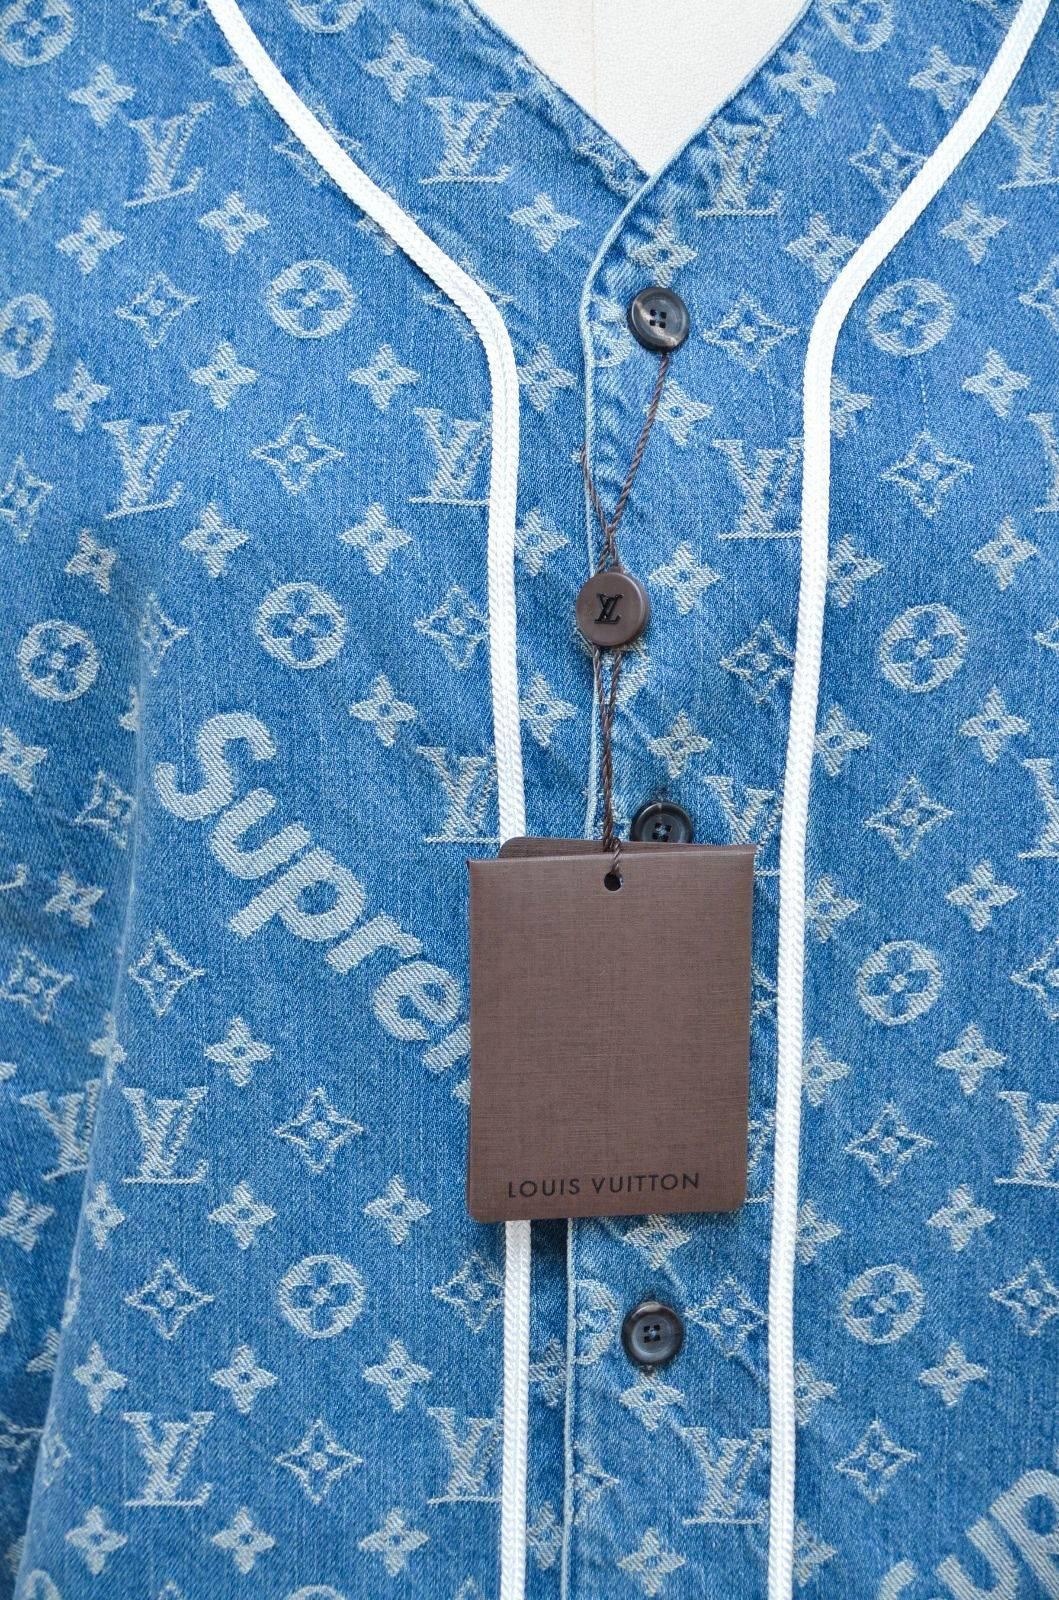 009967cc5100c3 Supreme x Louis Vuitton LV All Over Monogram Denim Baseball Jersey Sz Medium  For Sale at 1stdibs